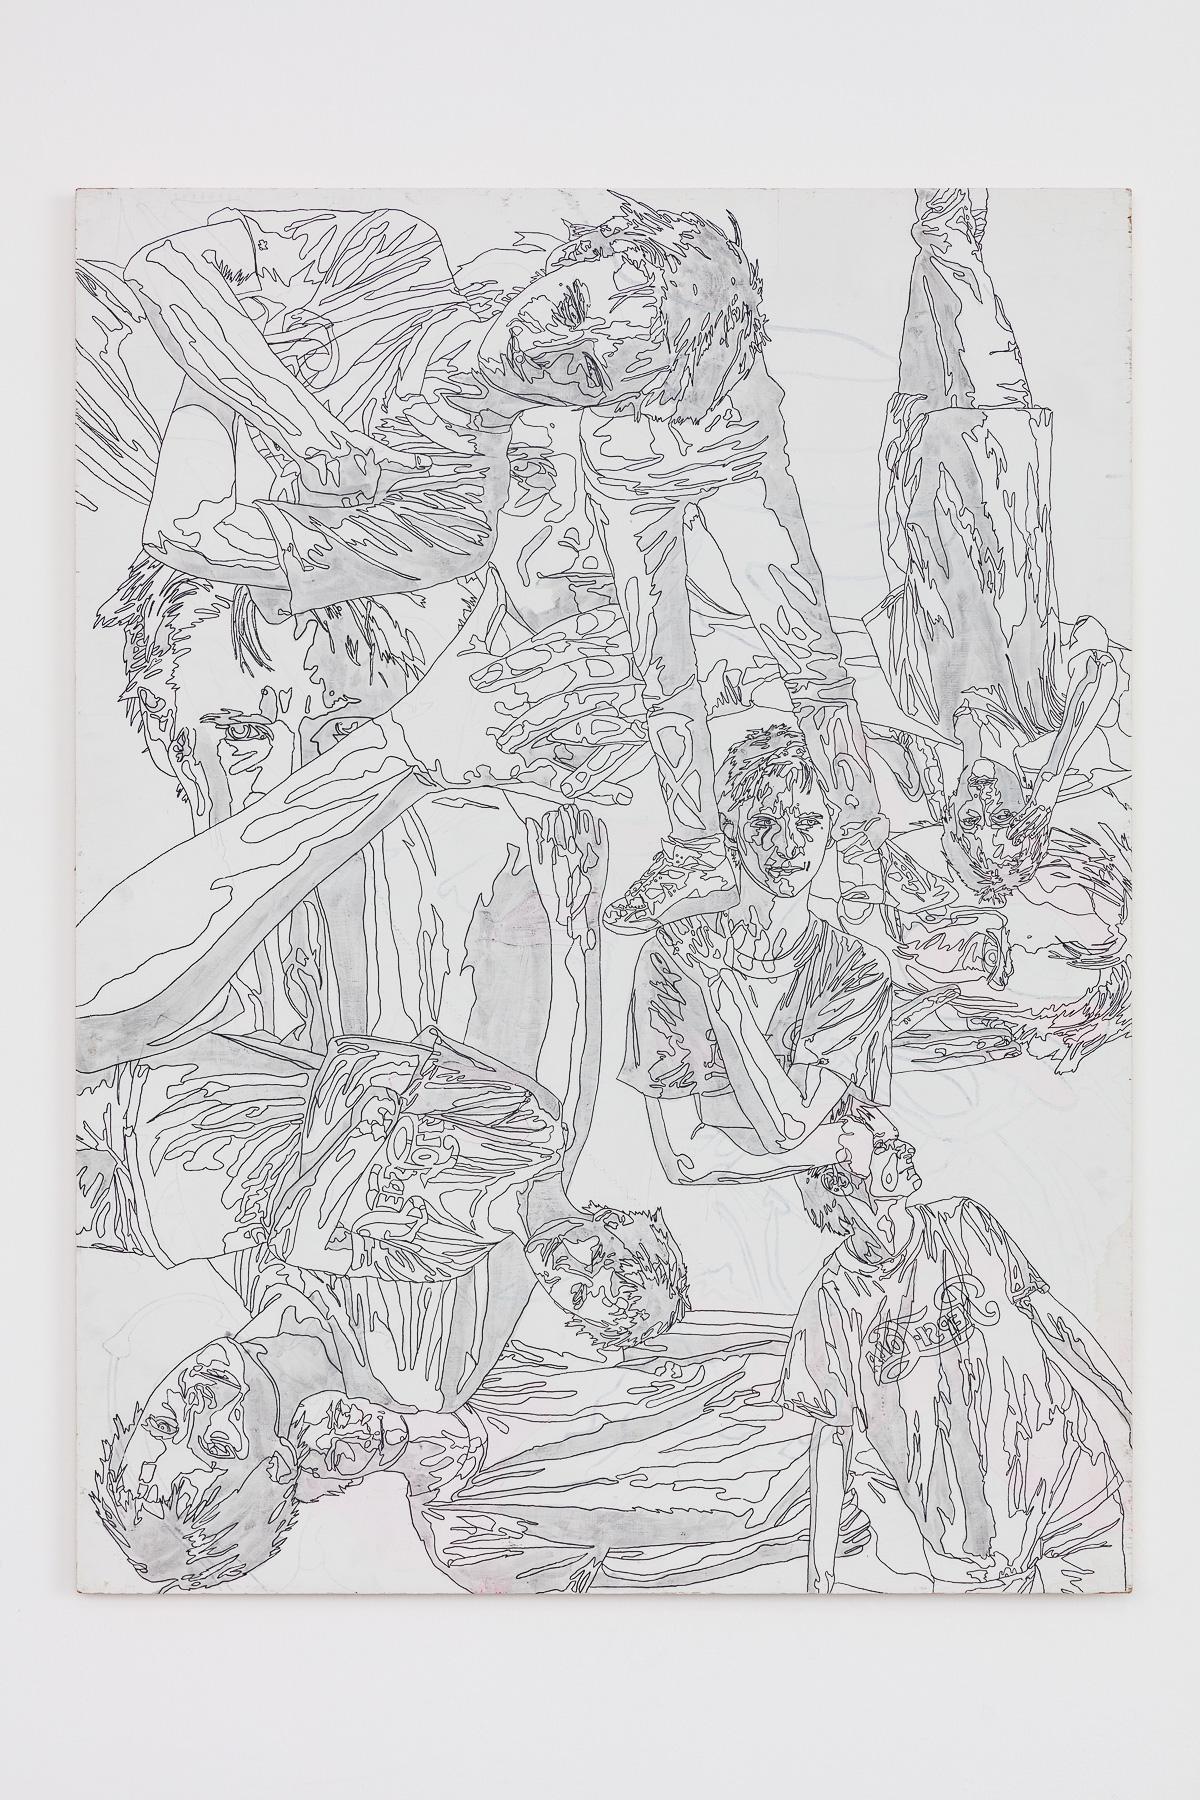 2019_04_Ausstellungsansichten_Francis-Ruyter_hurricane-time-image_026_web.jpg